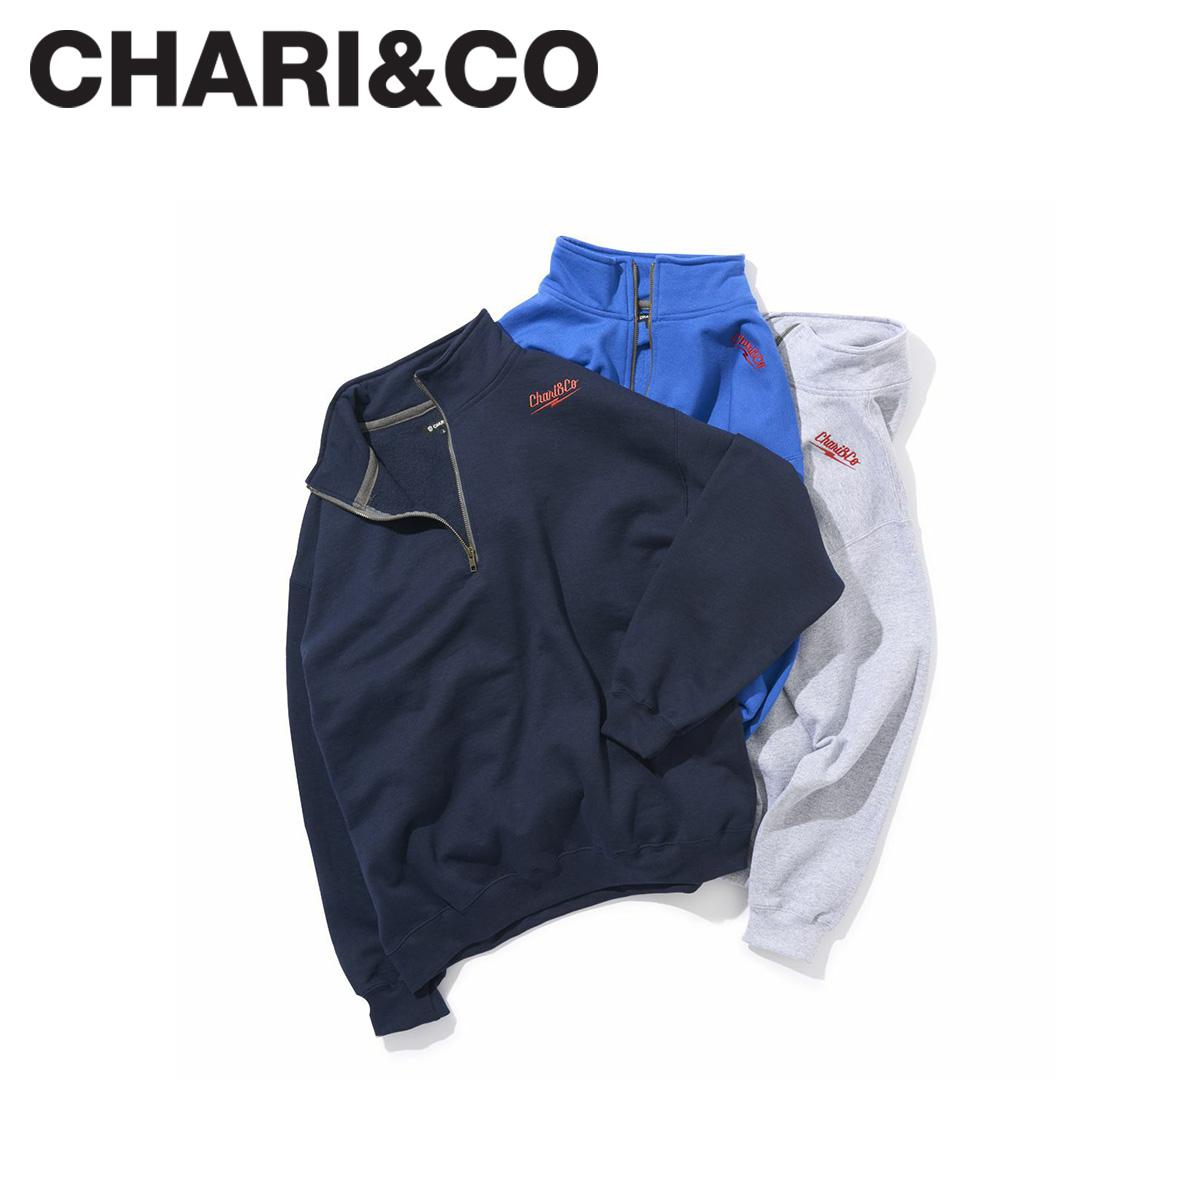 CHARI&CO チャリアンドコー スウェット メンズ レディース THUNDER LOGO HI NECK SWEATS グレー ネイビー ブルー